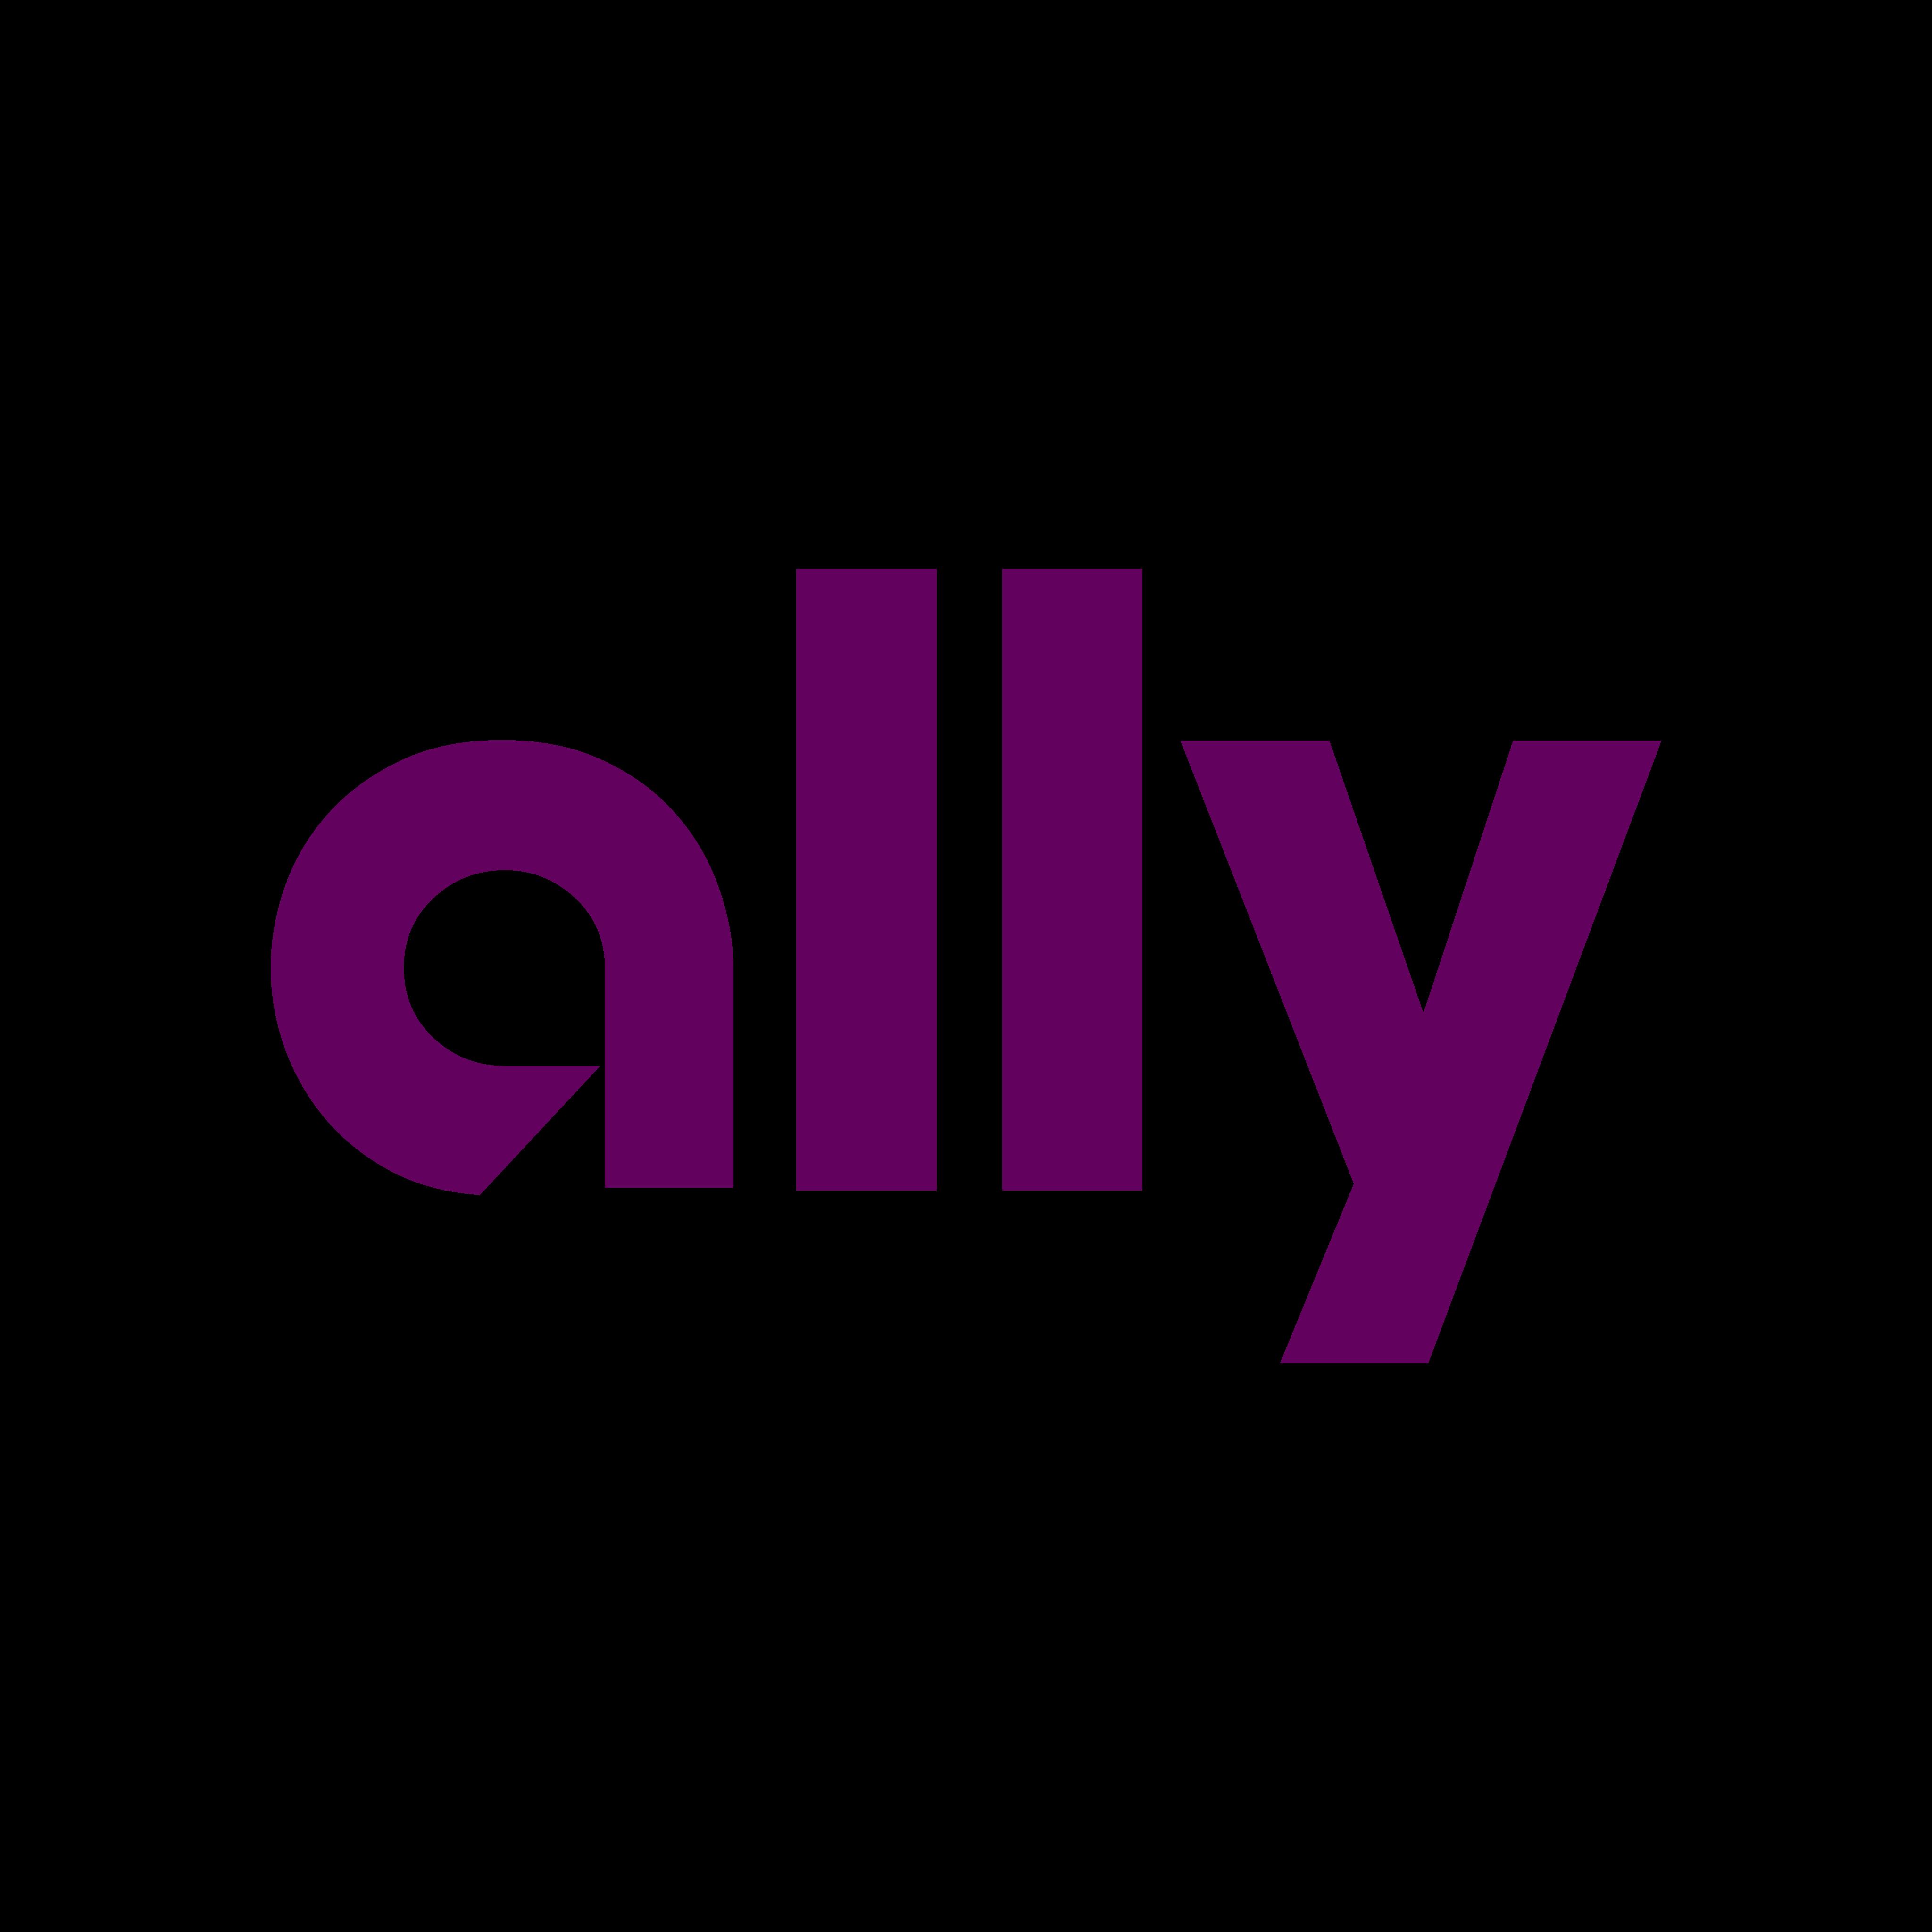 ally logo 0 - Ally Invest Logo